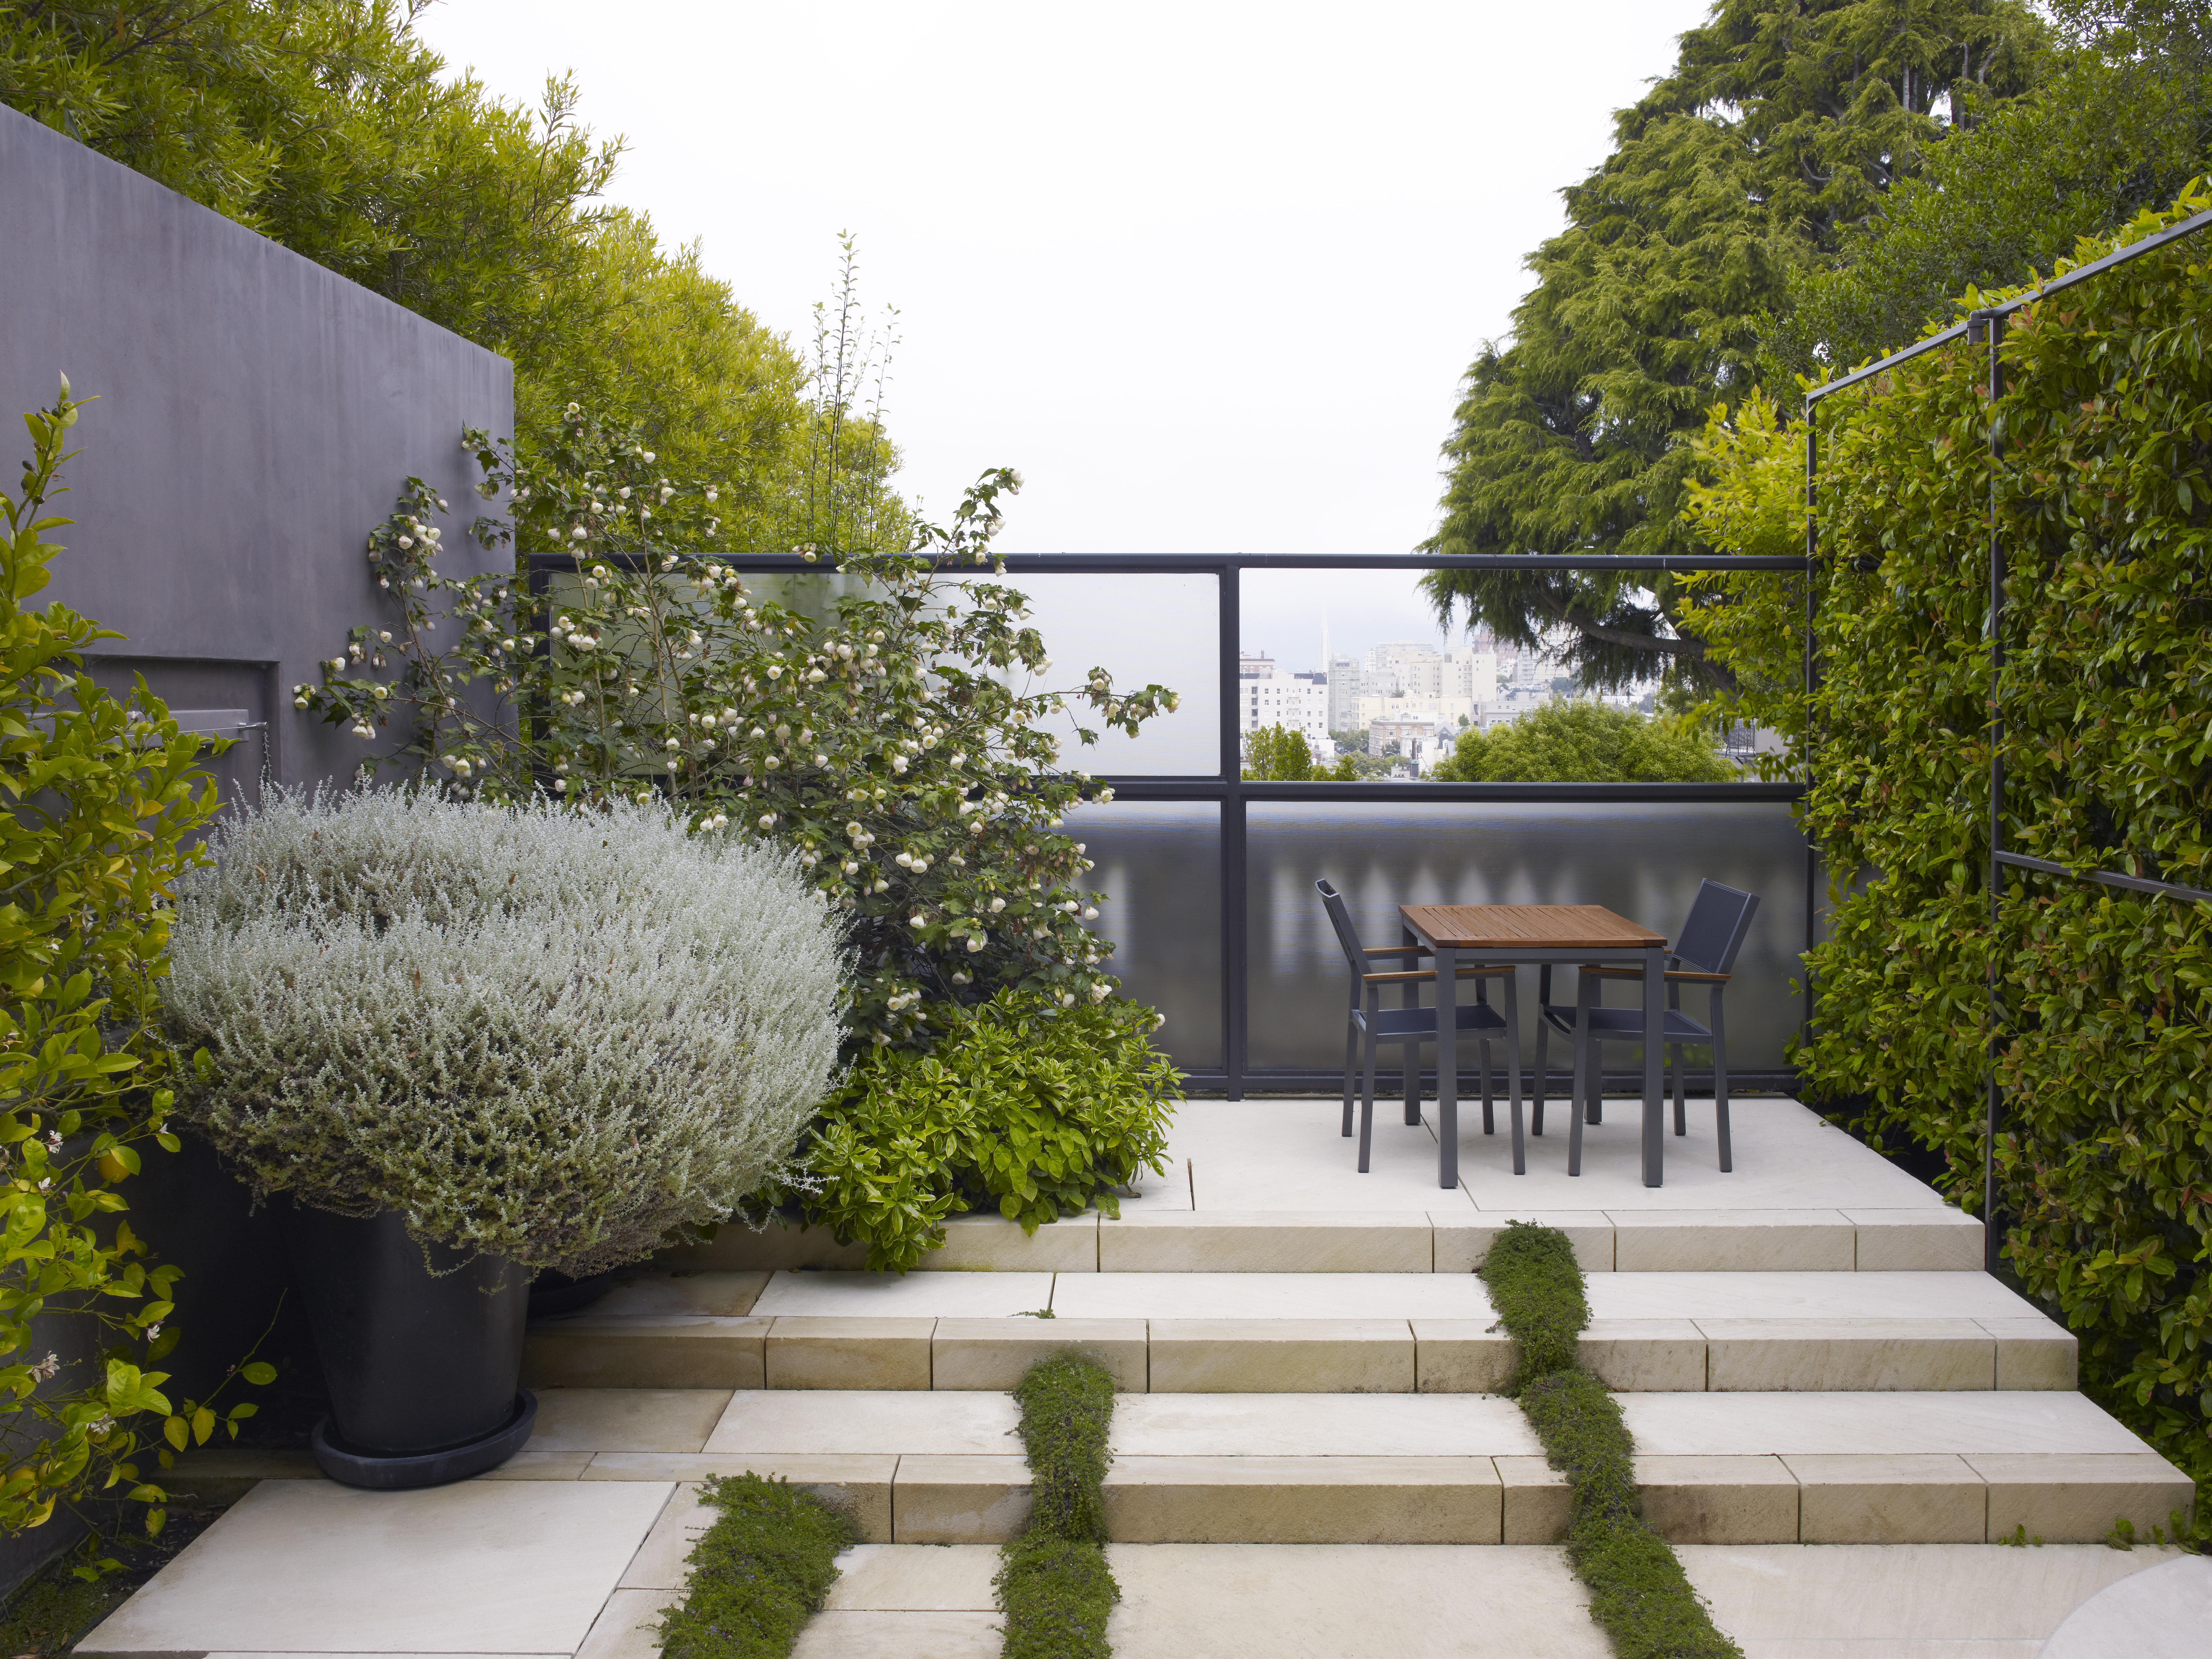 Asla 2010 professional awards san francisco residence for San francisco landscape architecture